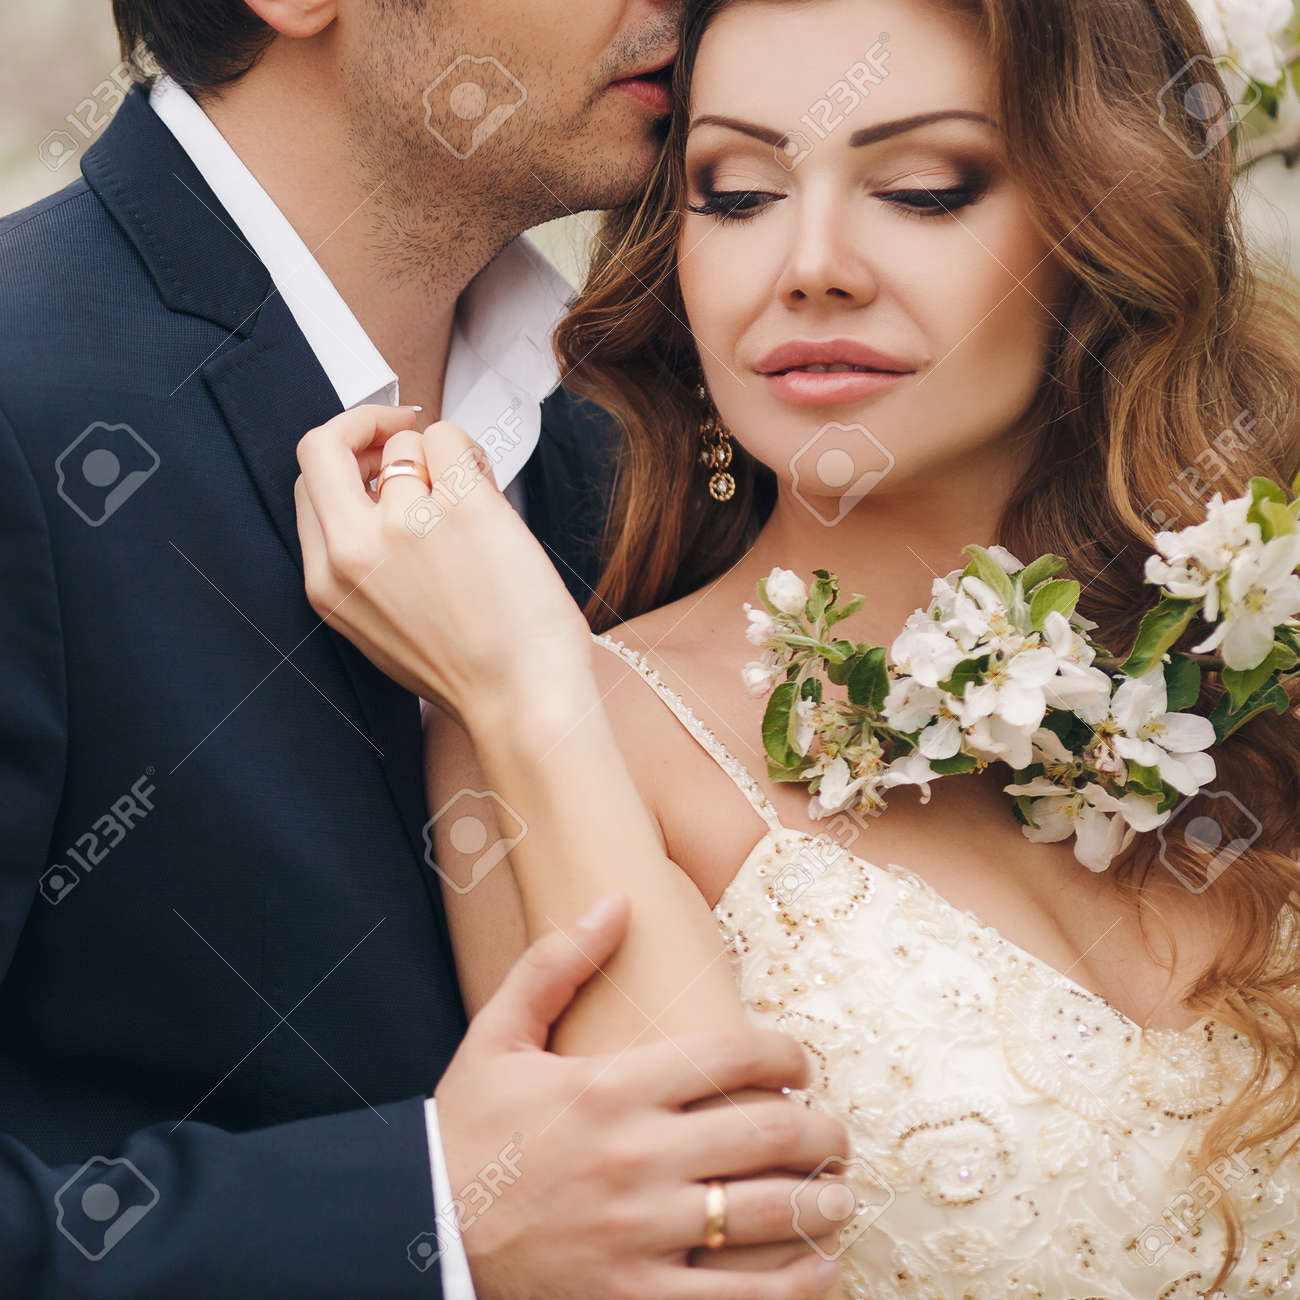 Capelli da matrimonio uomo